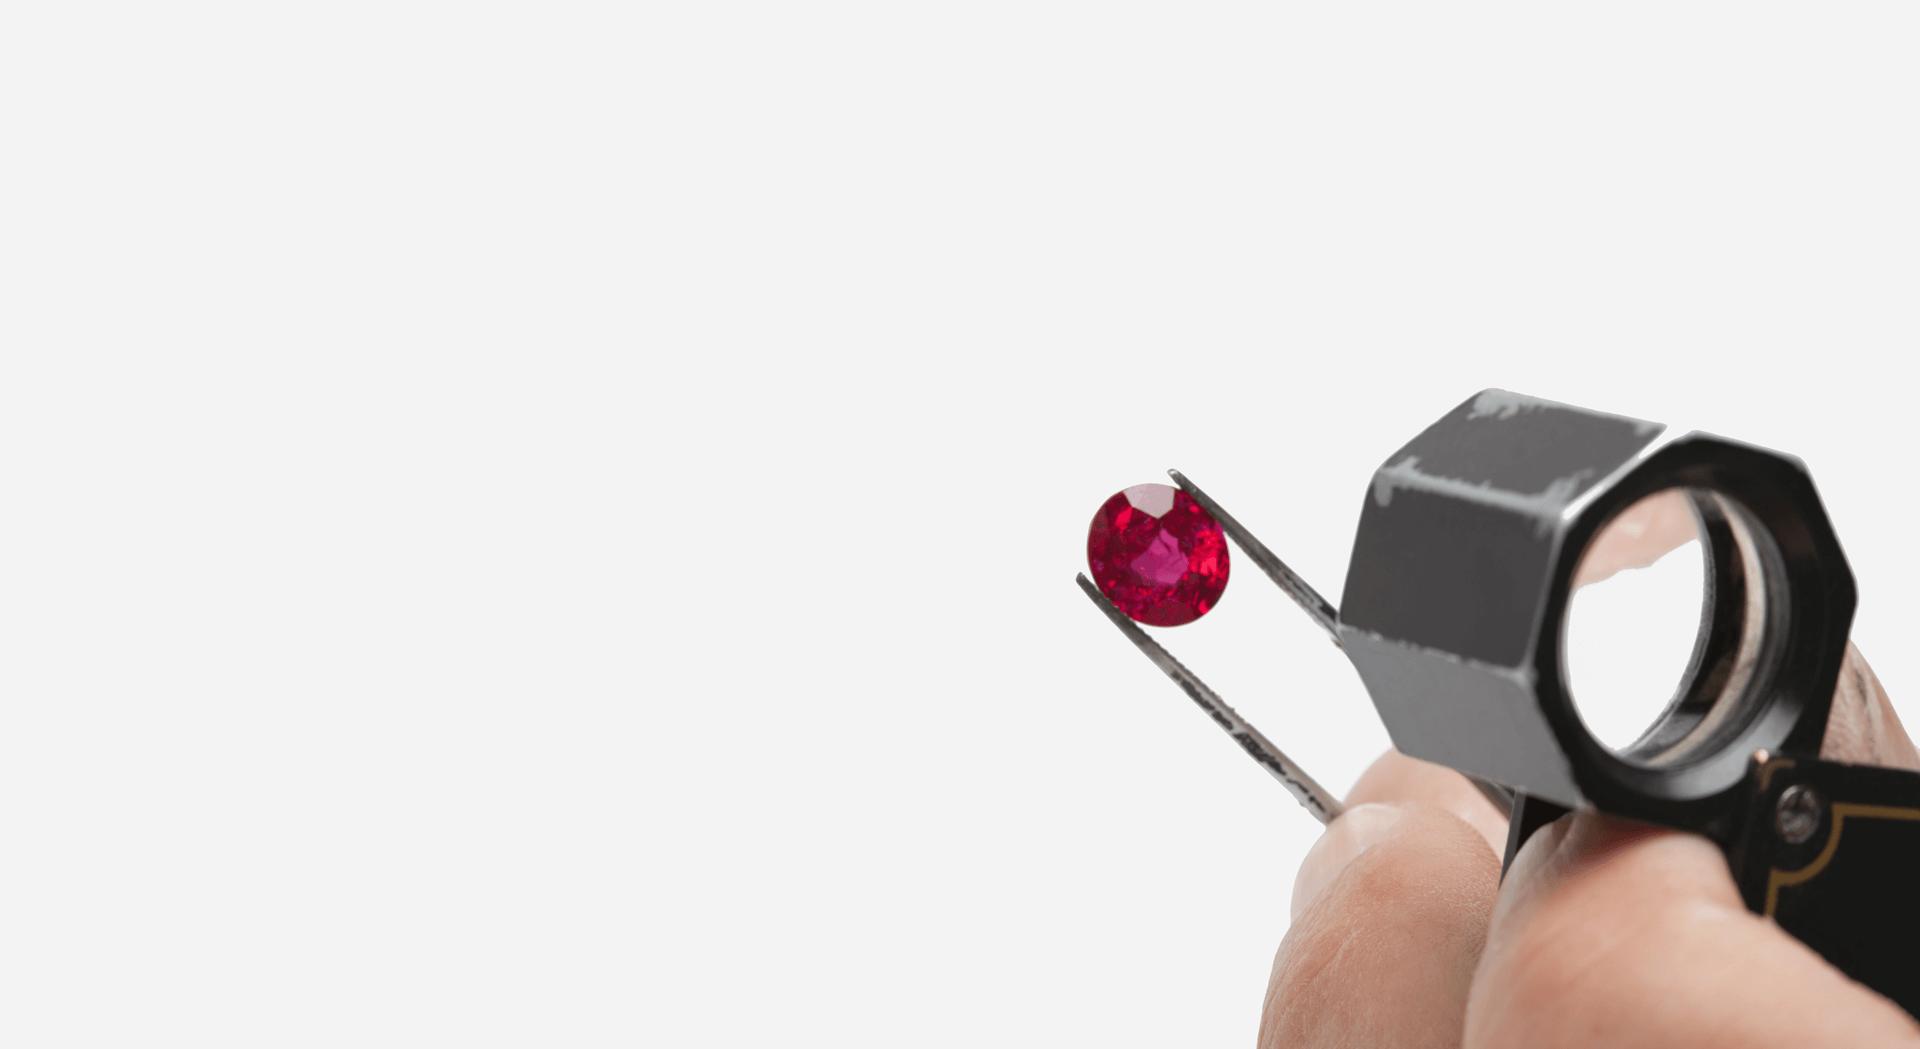 rubin-lupe